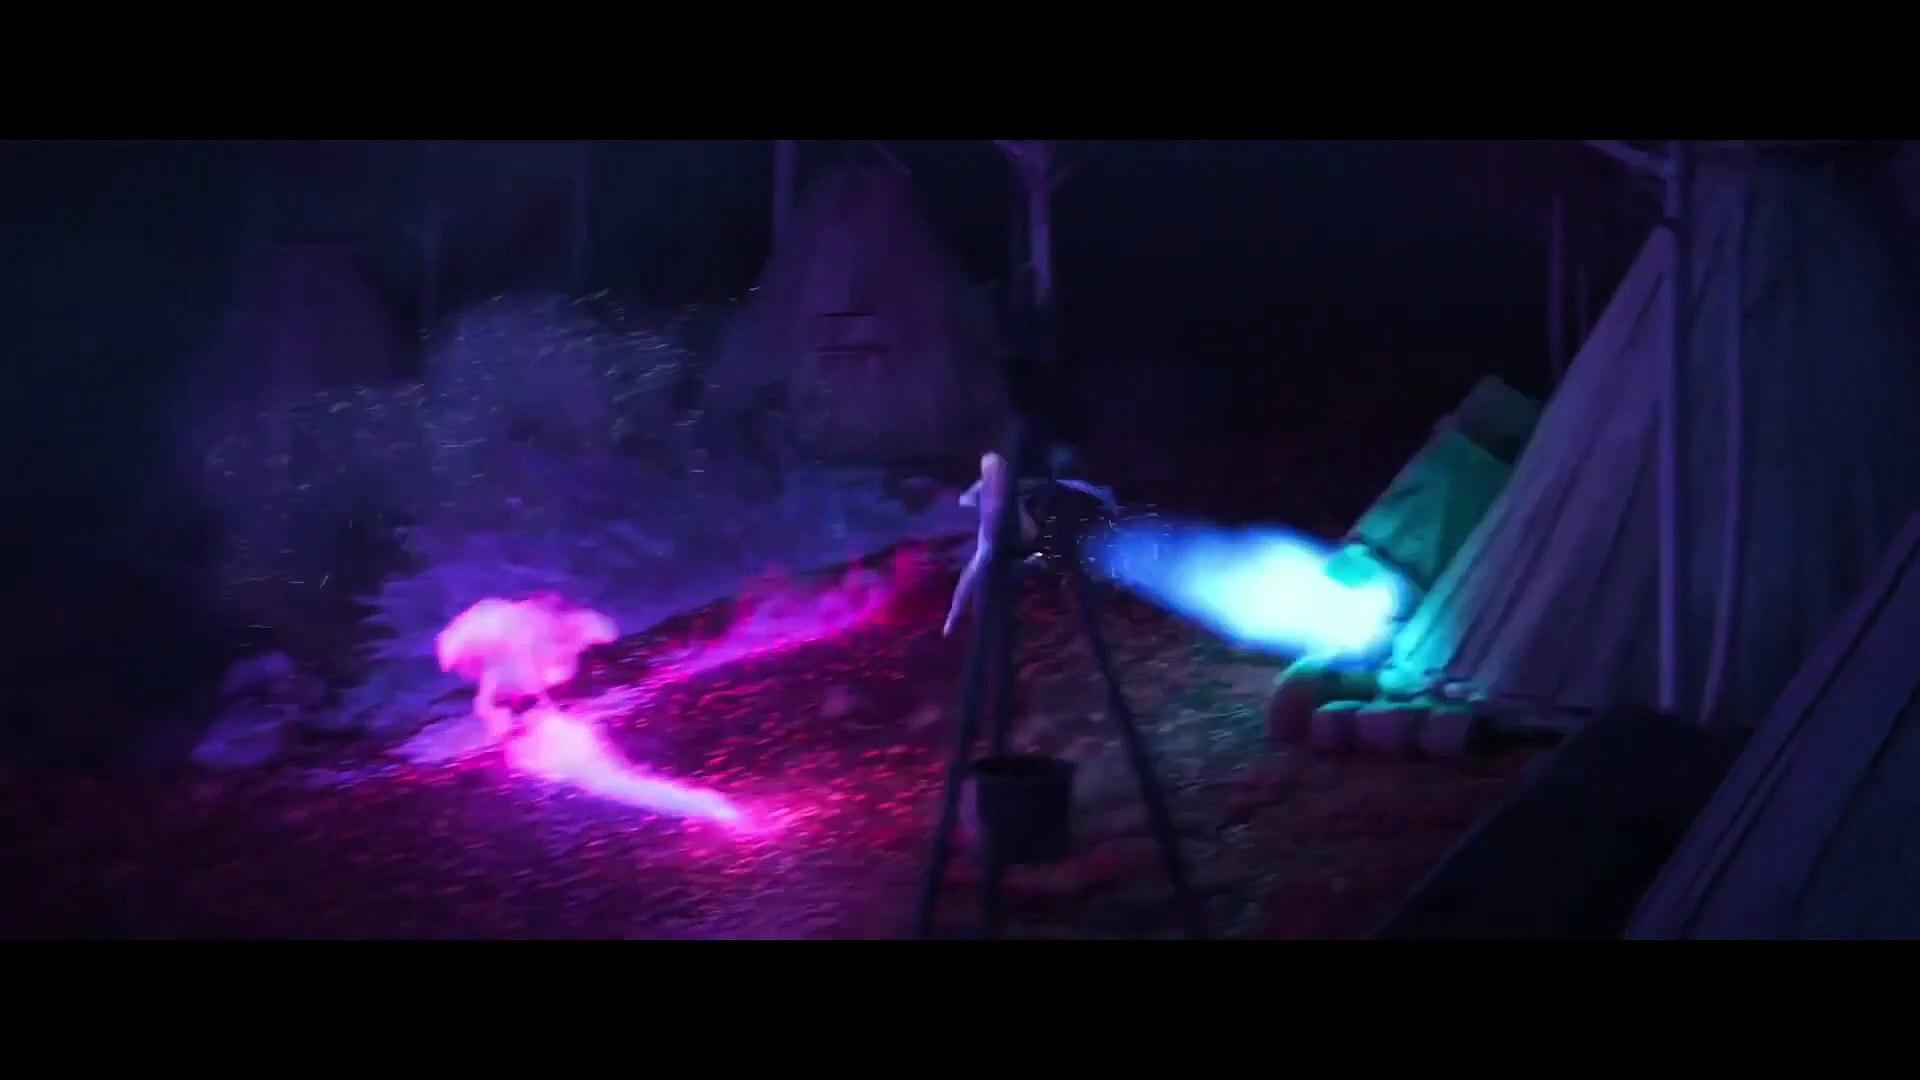 Frozen 2 Movie Clip Elsa Meets Bruni The Fire Spirit Salamander Video Dailymotion